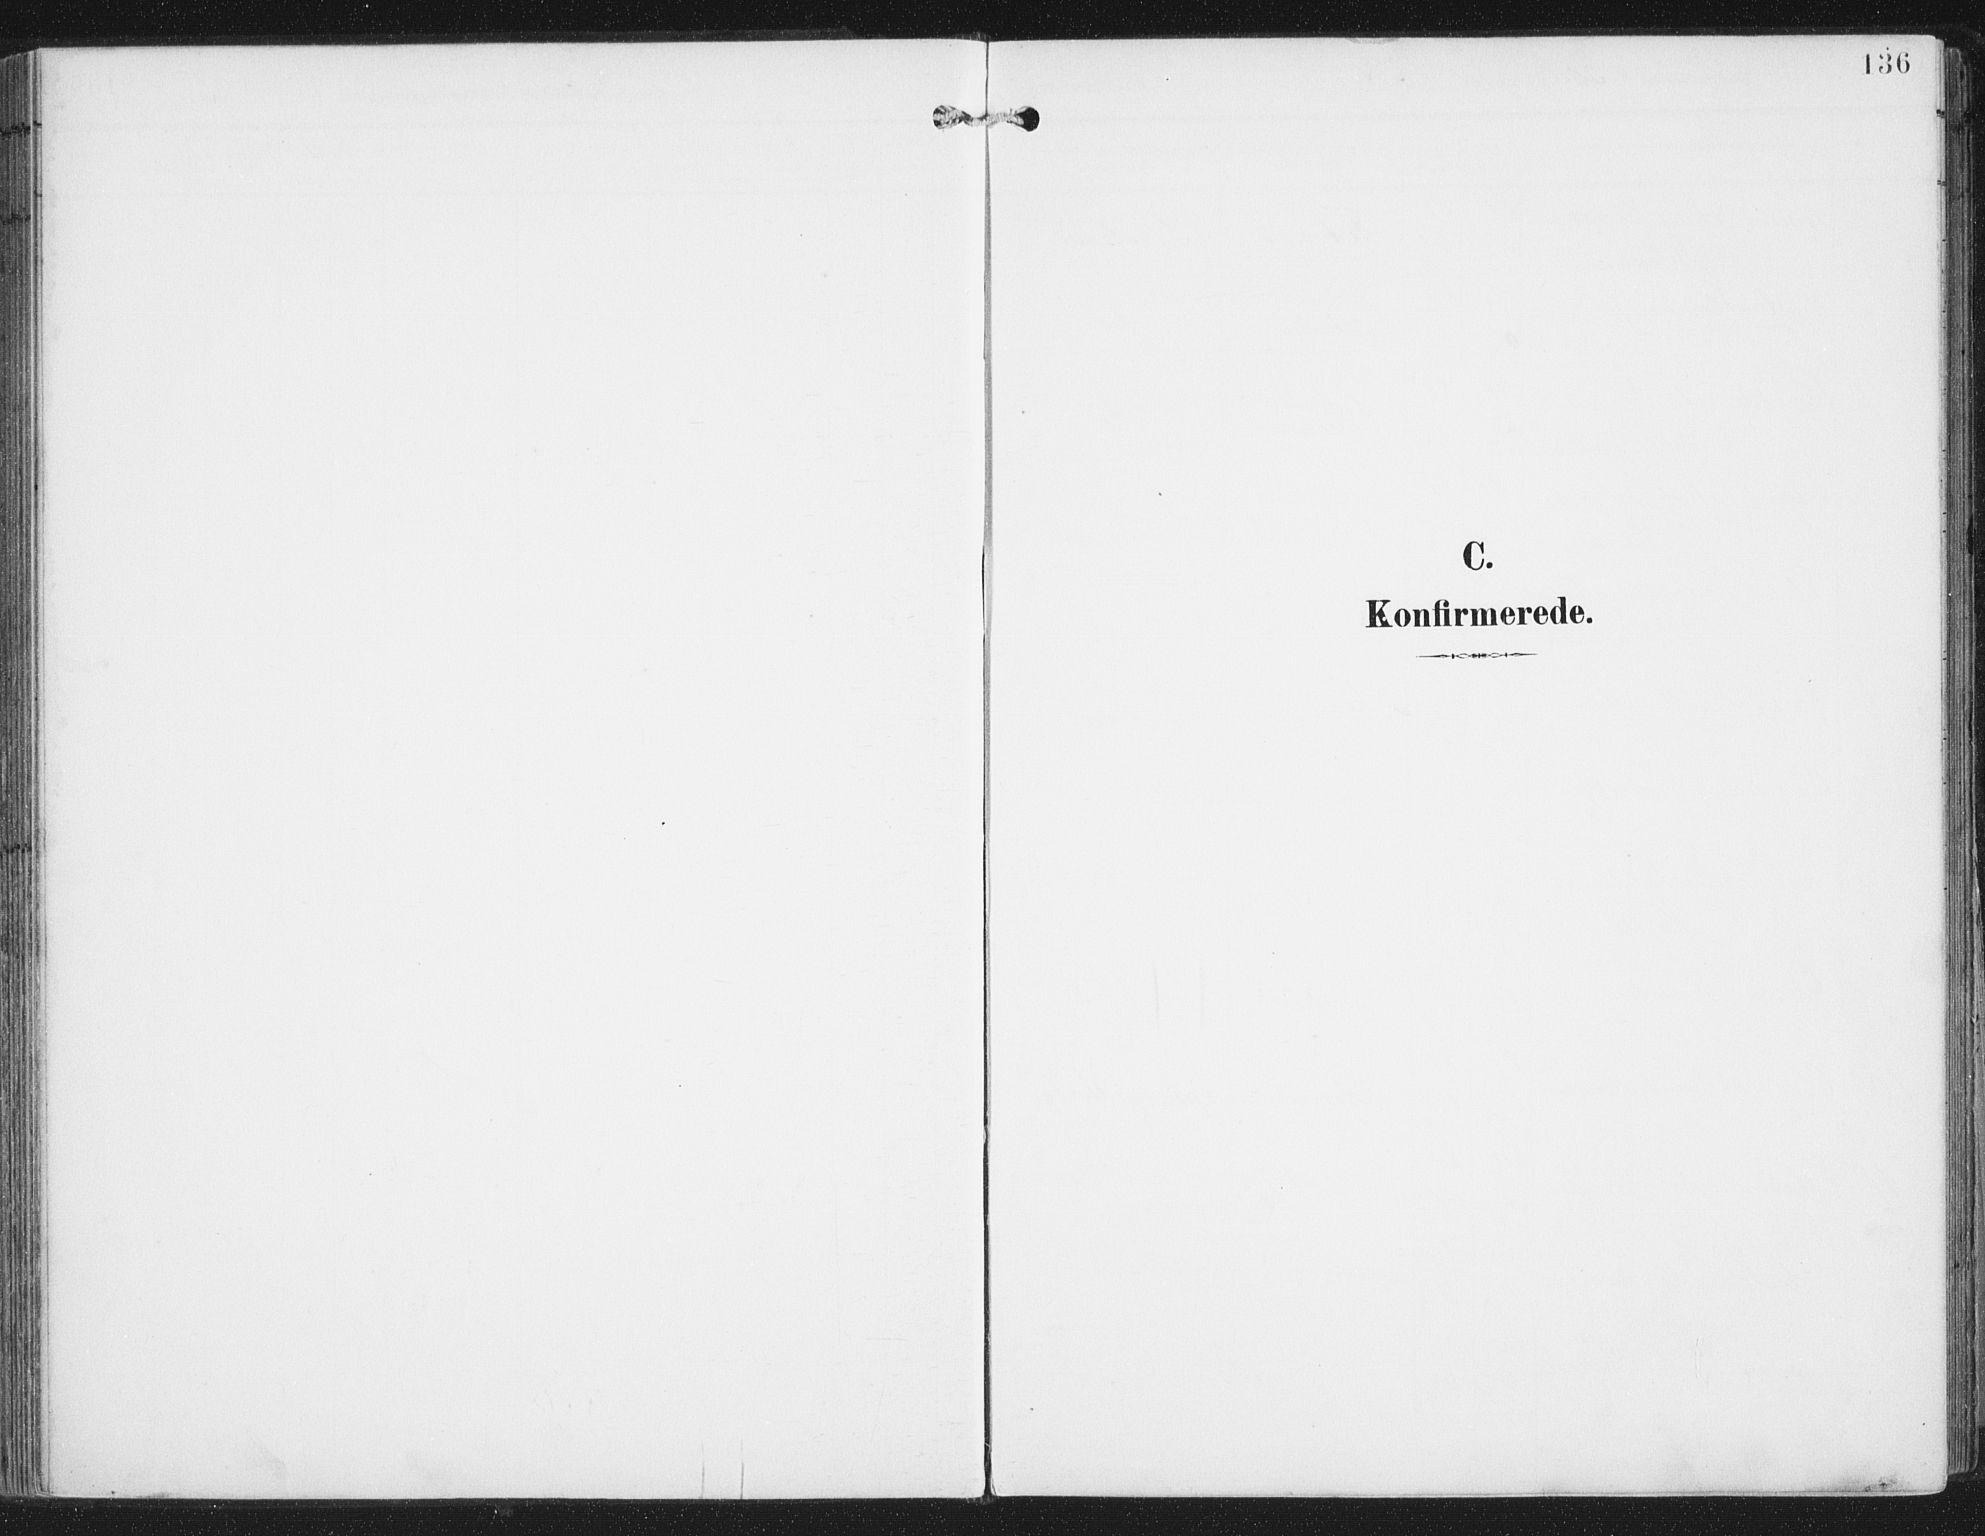 SAT, Ministerialprotokoller, klokkerbøker og fødselsregistre - Nordland, 876/L1098: Ministerialbok nr. 876A04, 1896-1915, s. 136